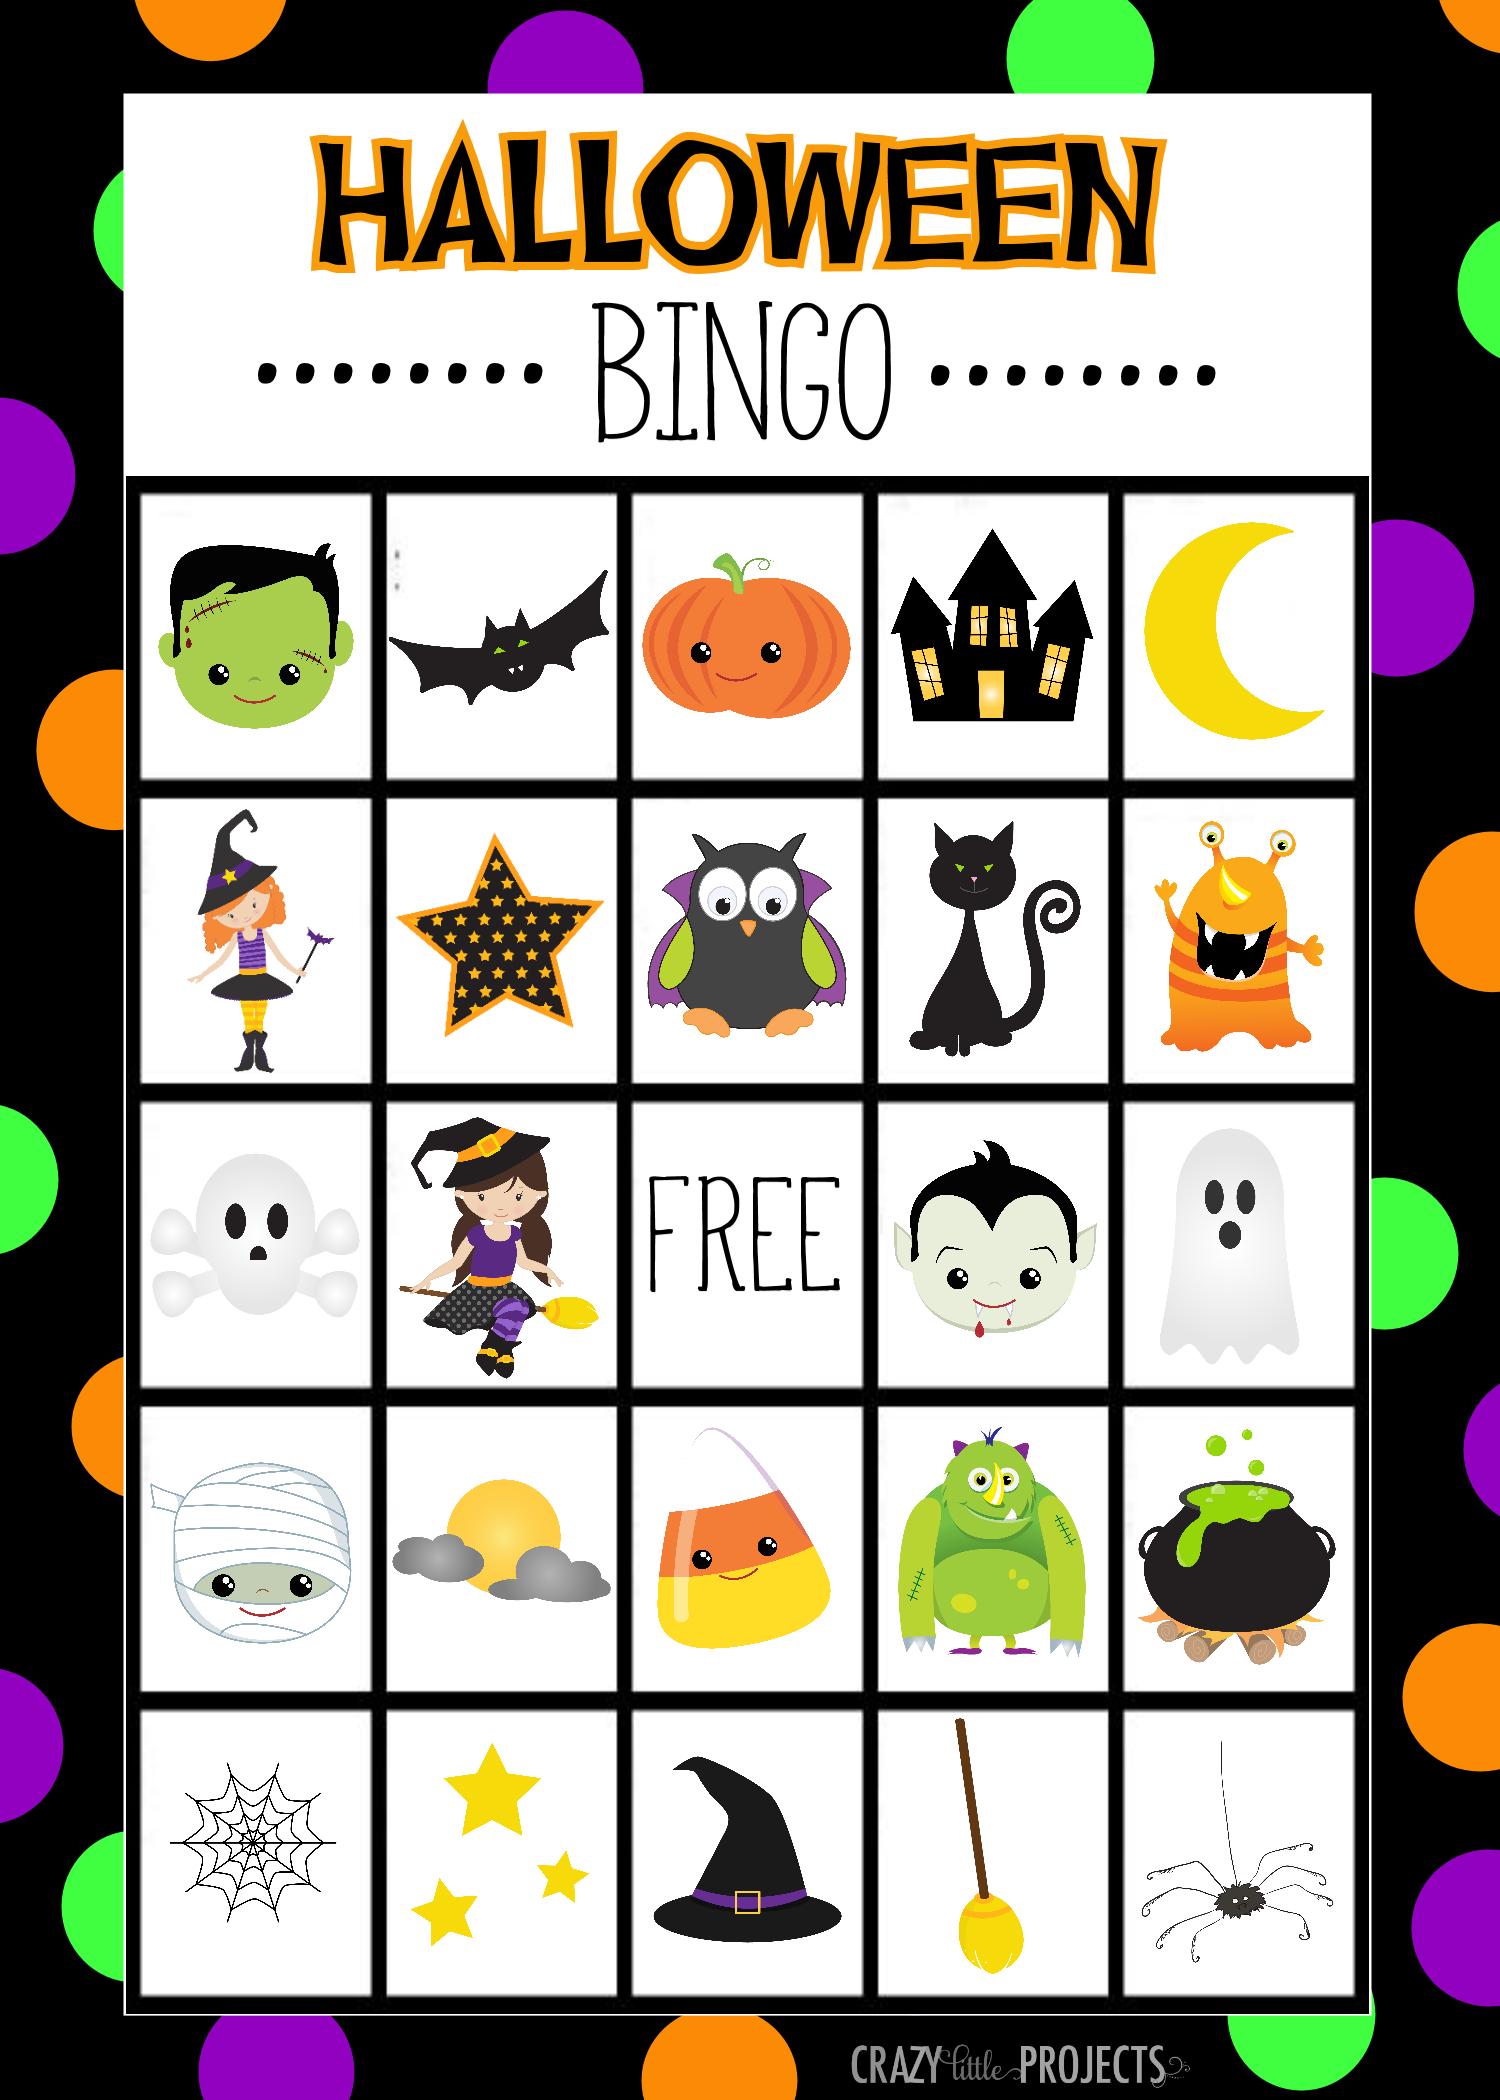 Halloween Bingo - Cute Free Printable Game   Halloween Bingo